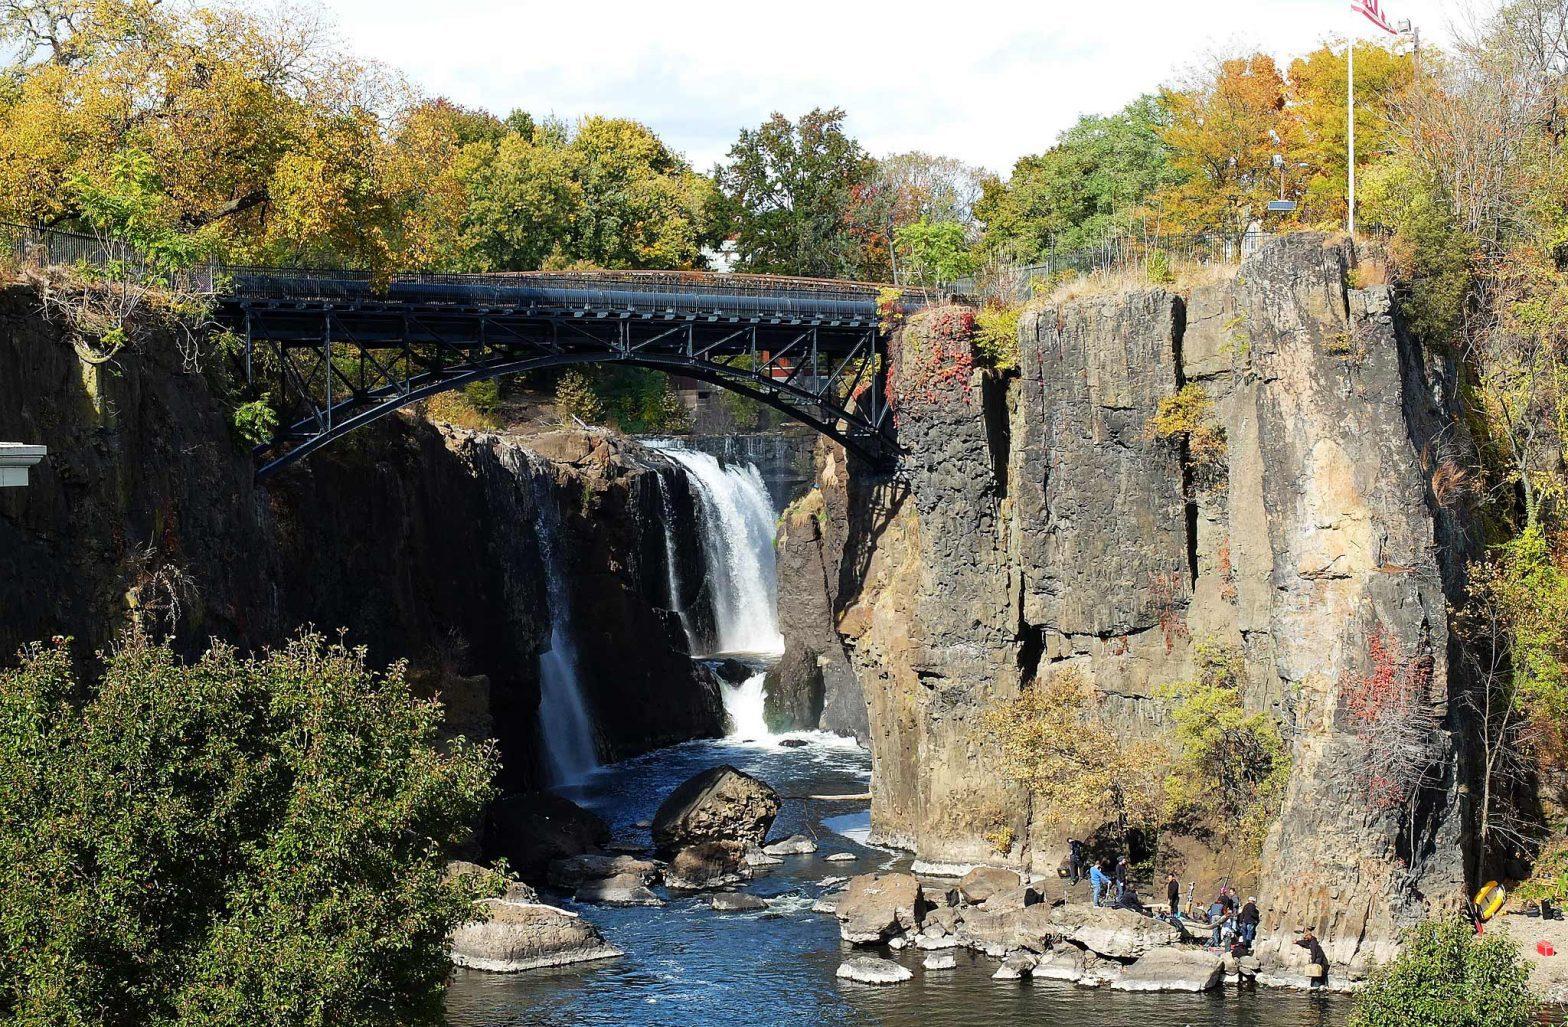 Paterson, NJ - Great Falls